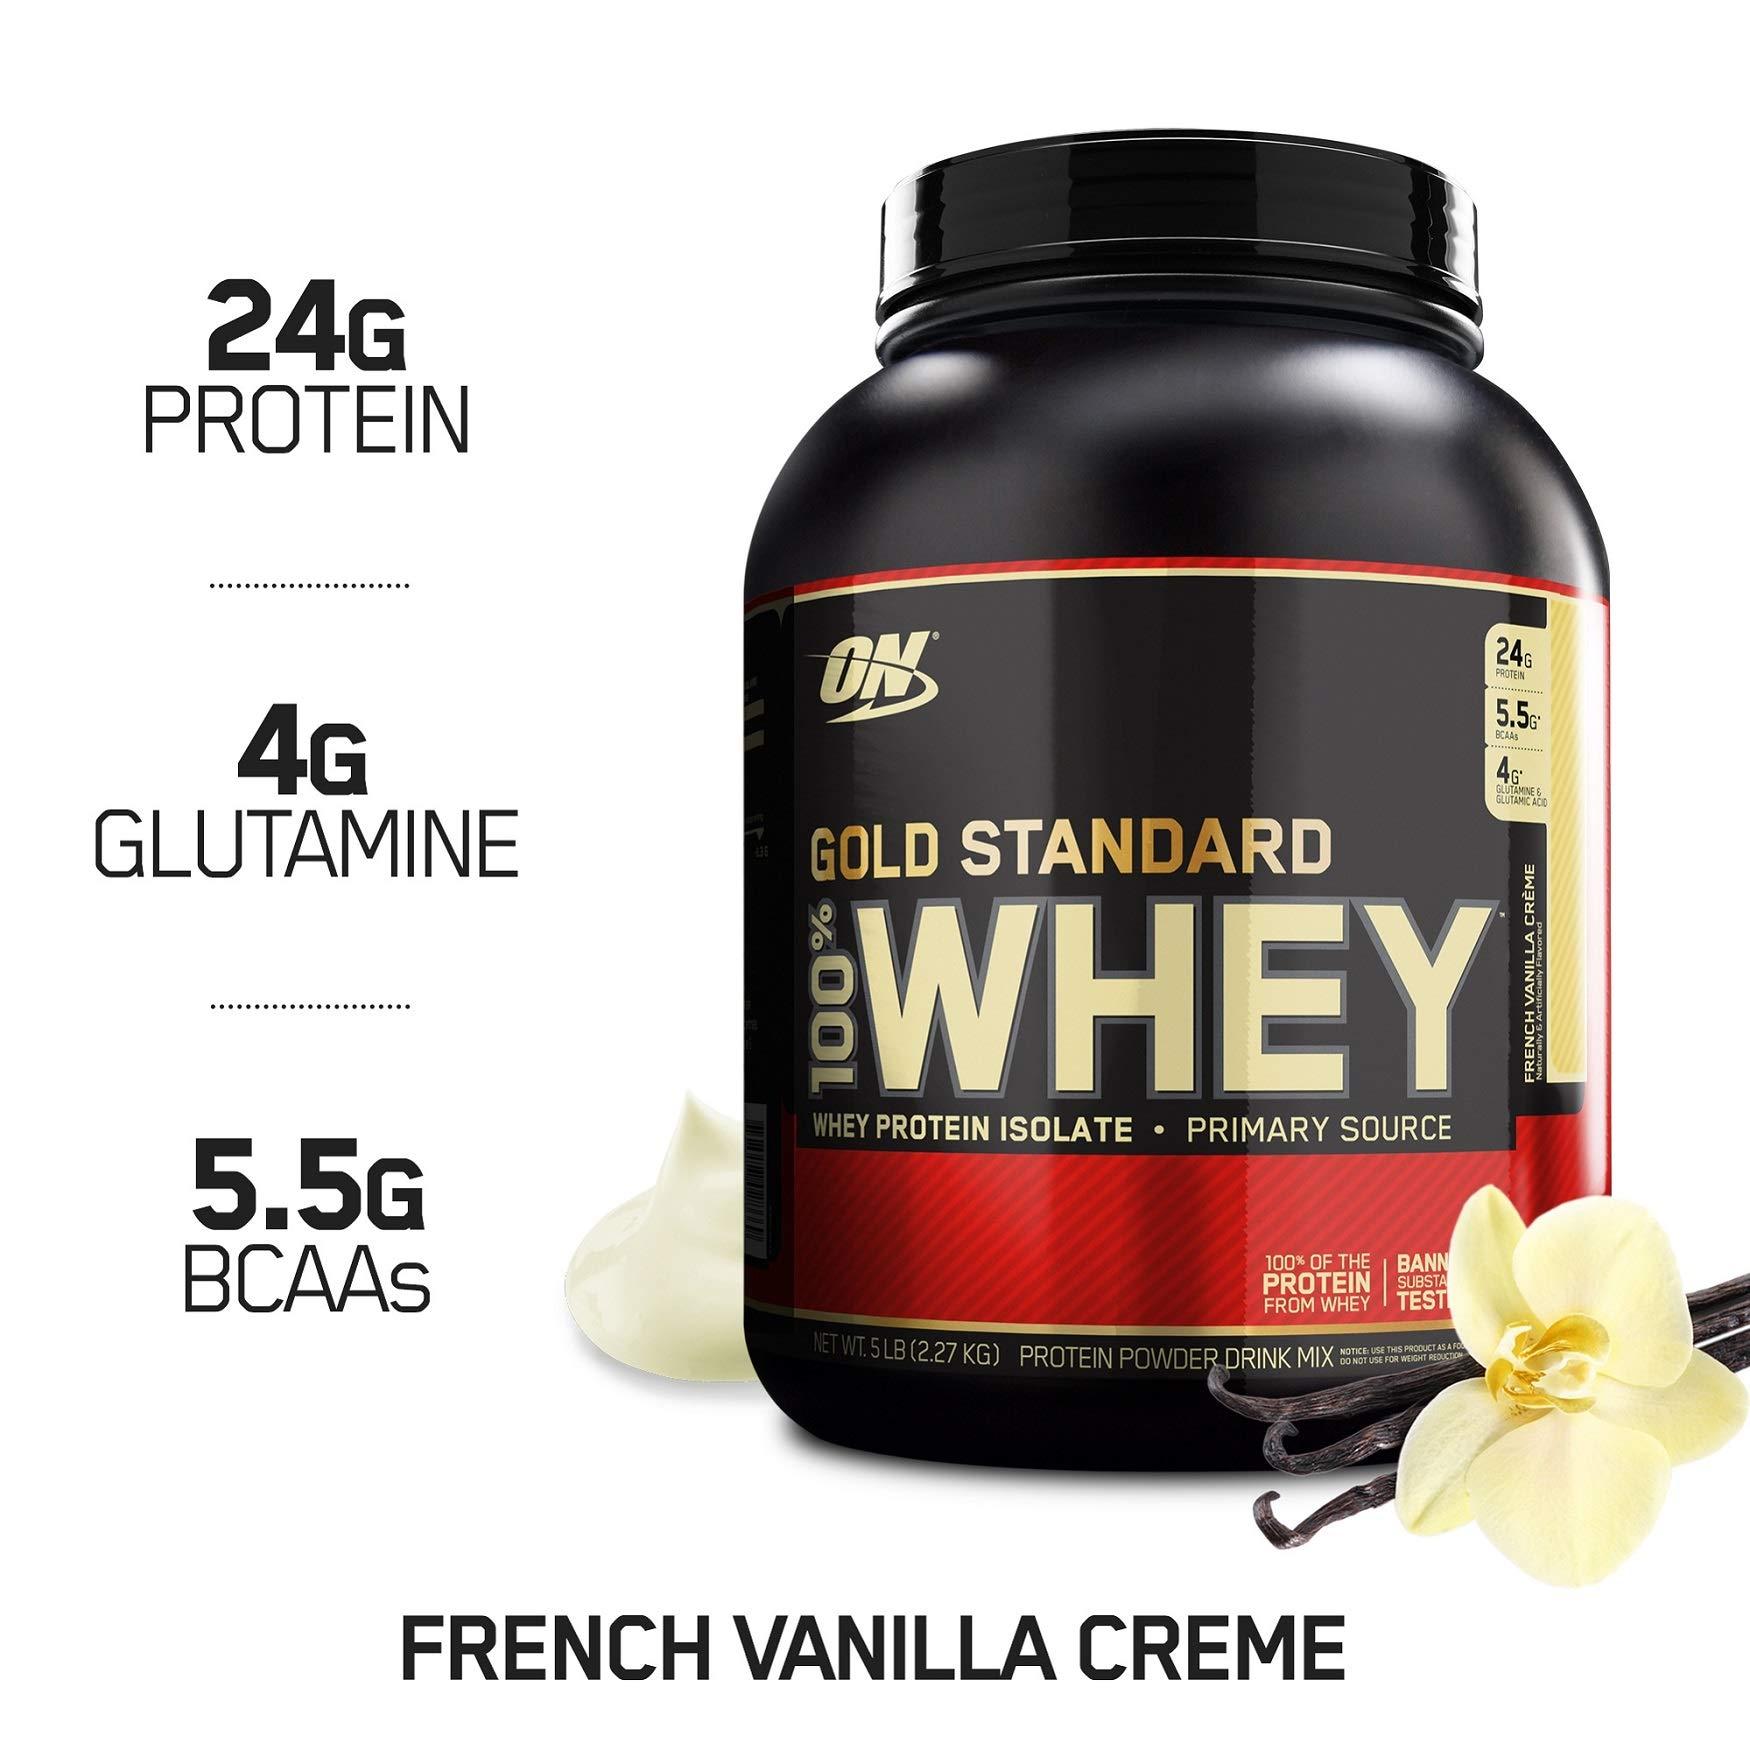 OPTIMUM NUTRITION GOLD STANDARD 100% Whey Protein Powder, French Vanilla Creme, 5 Pound by Optimum Nutrition